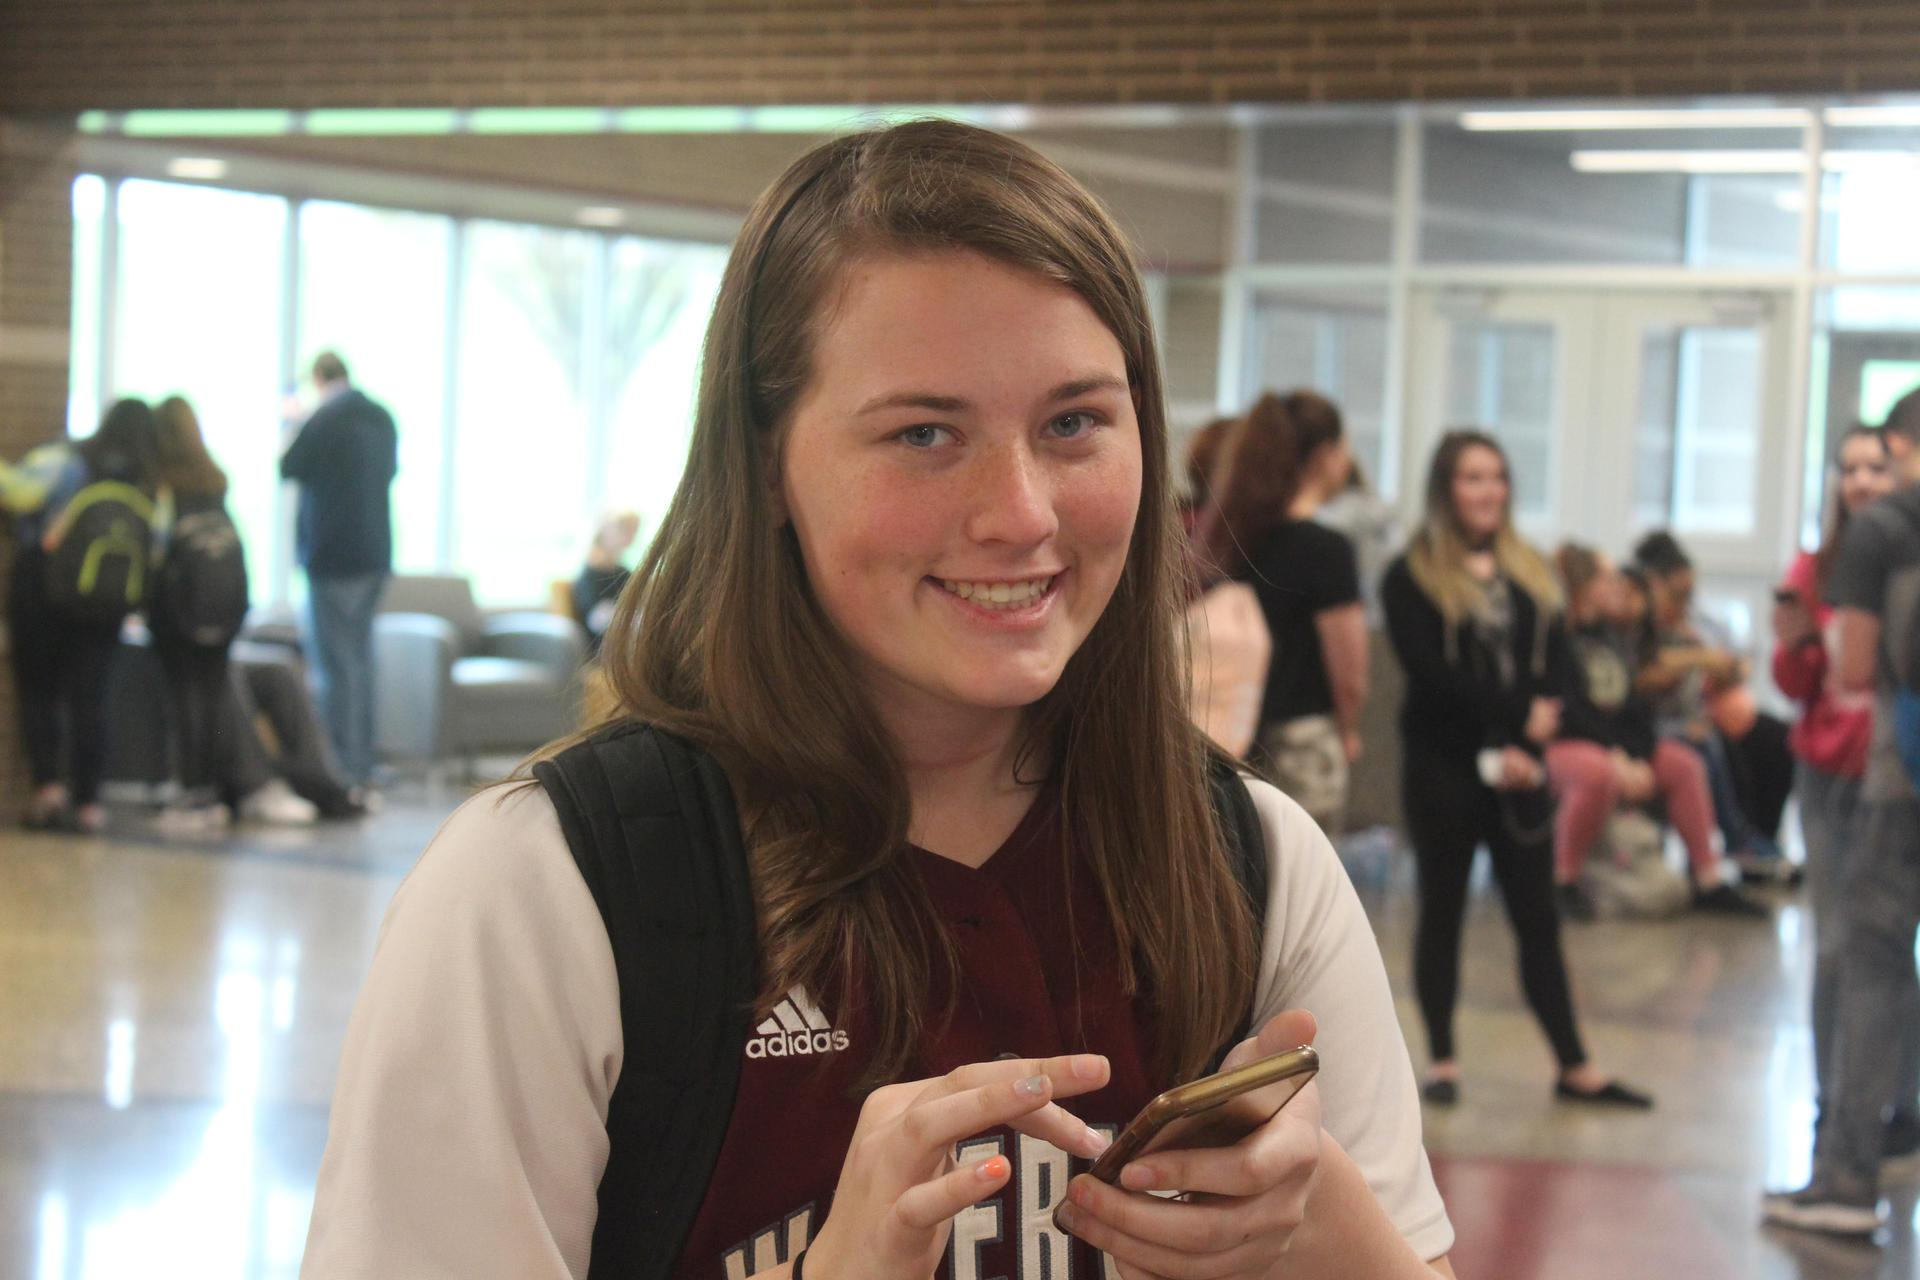 Kristen Gardiner in cafeteria